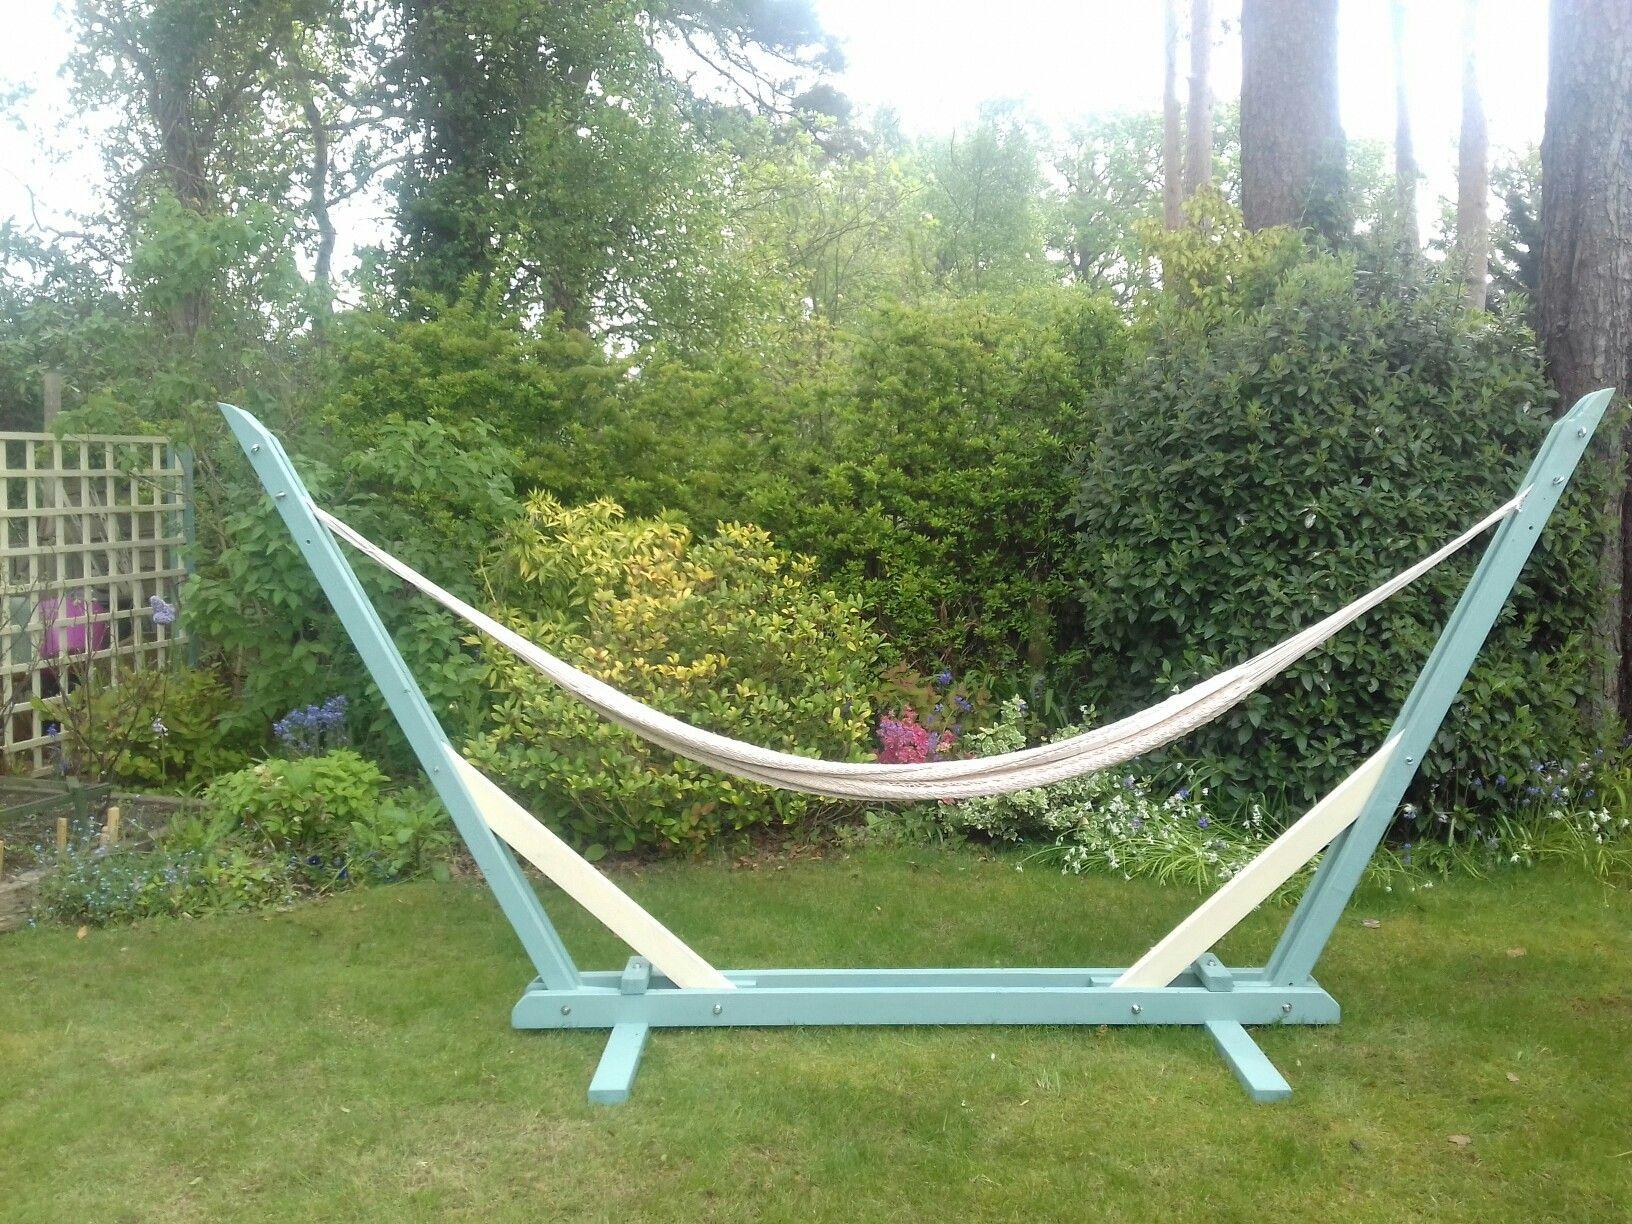 hammock youtube wood stand watch